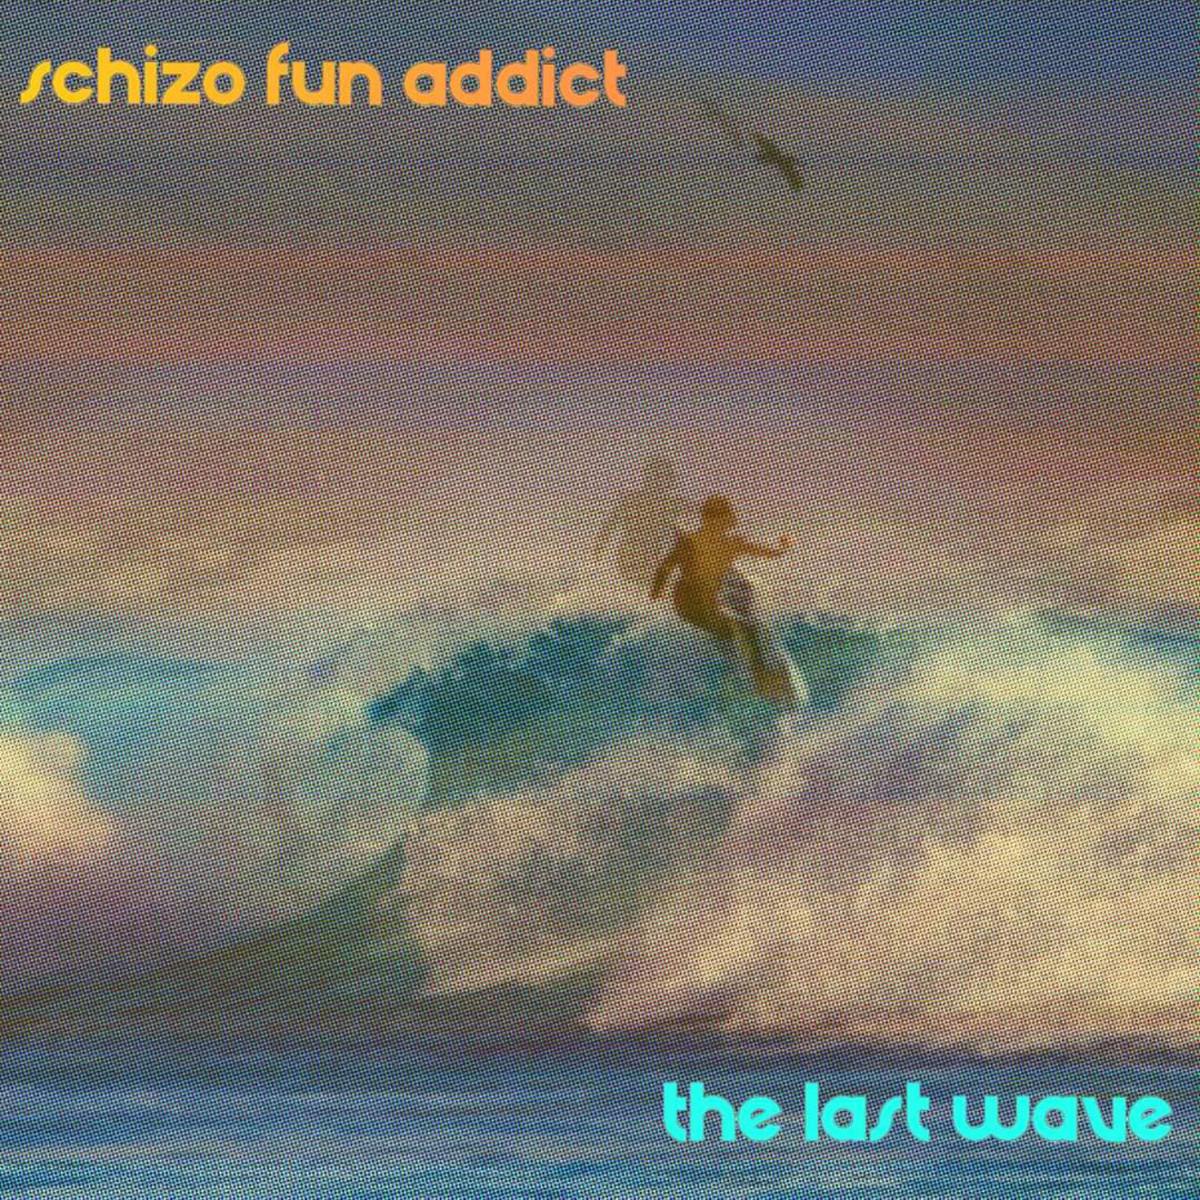 Schizo Fun Addict